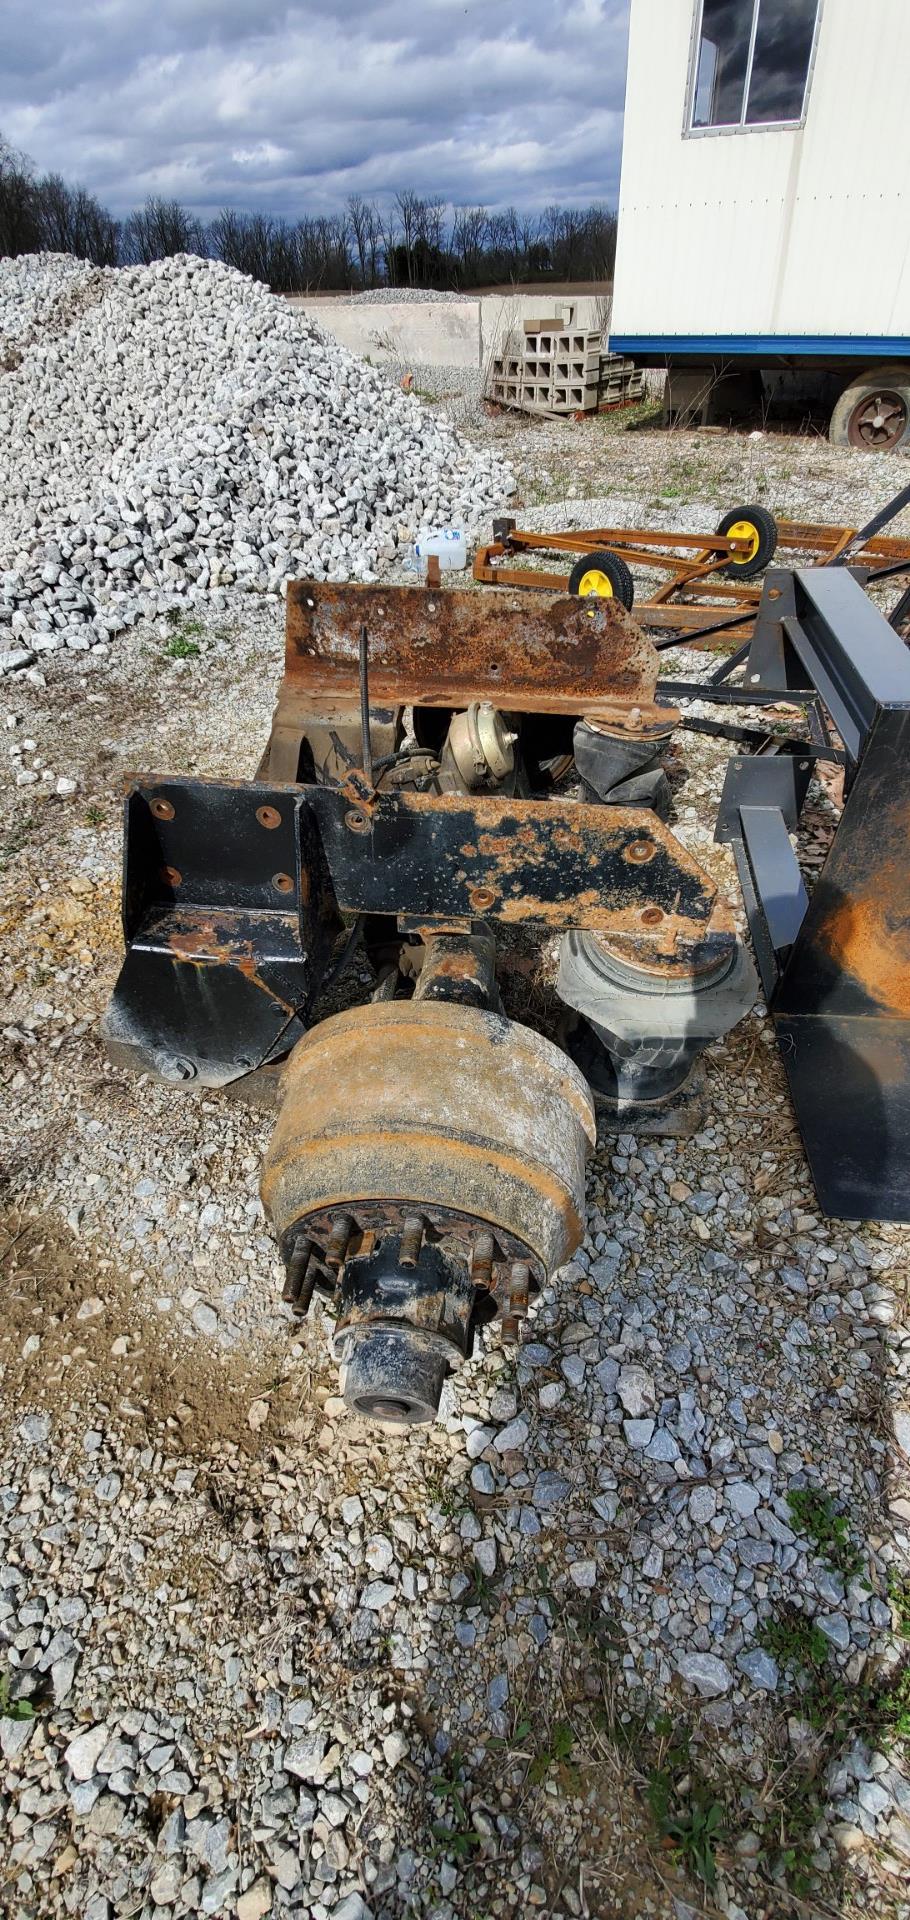 Dump Truck Lift Axle - Image 4 of 4